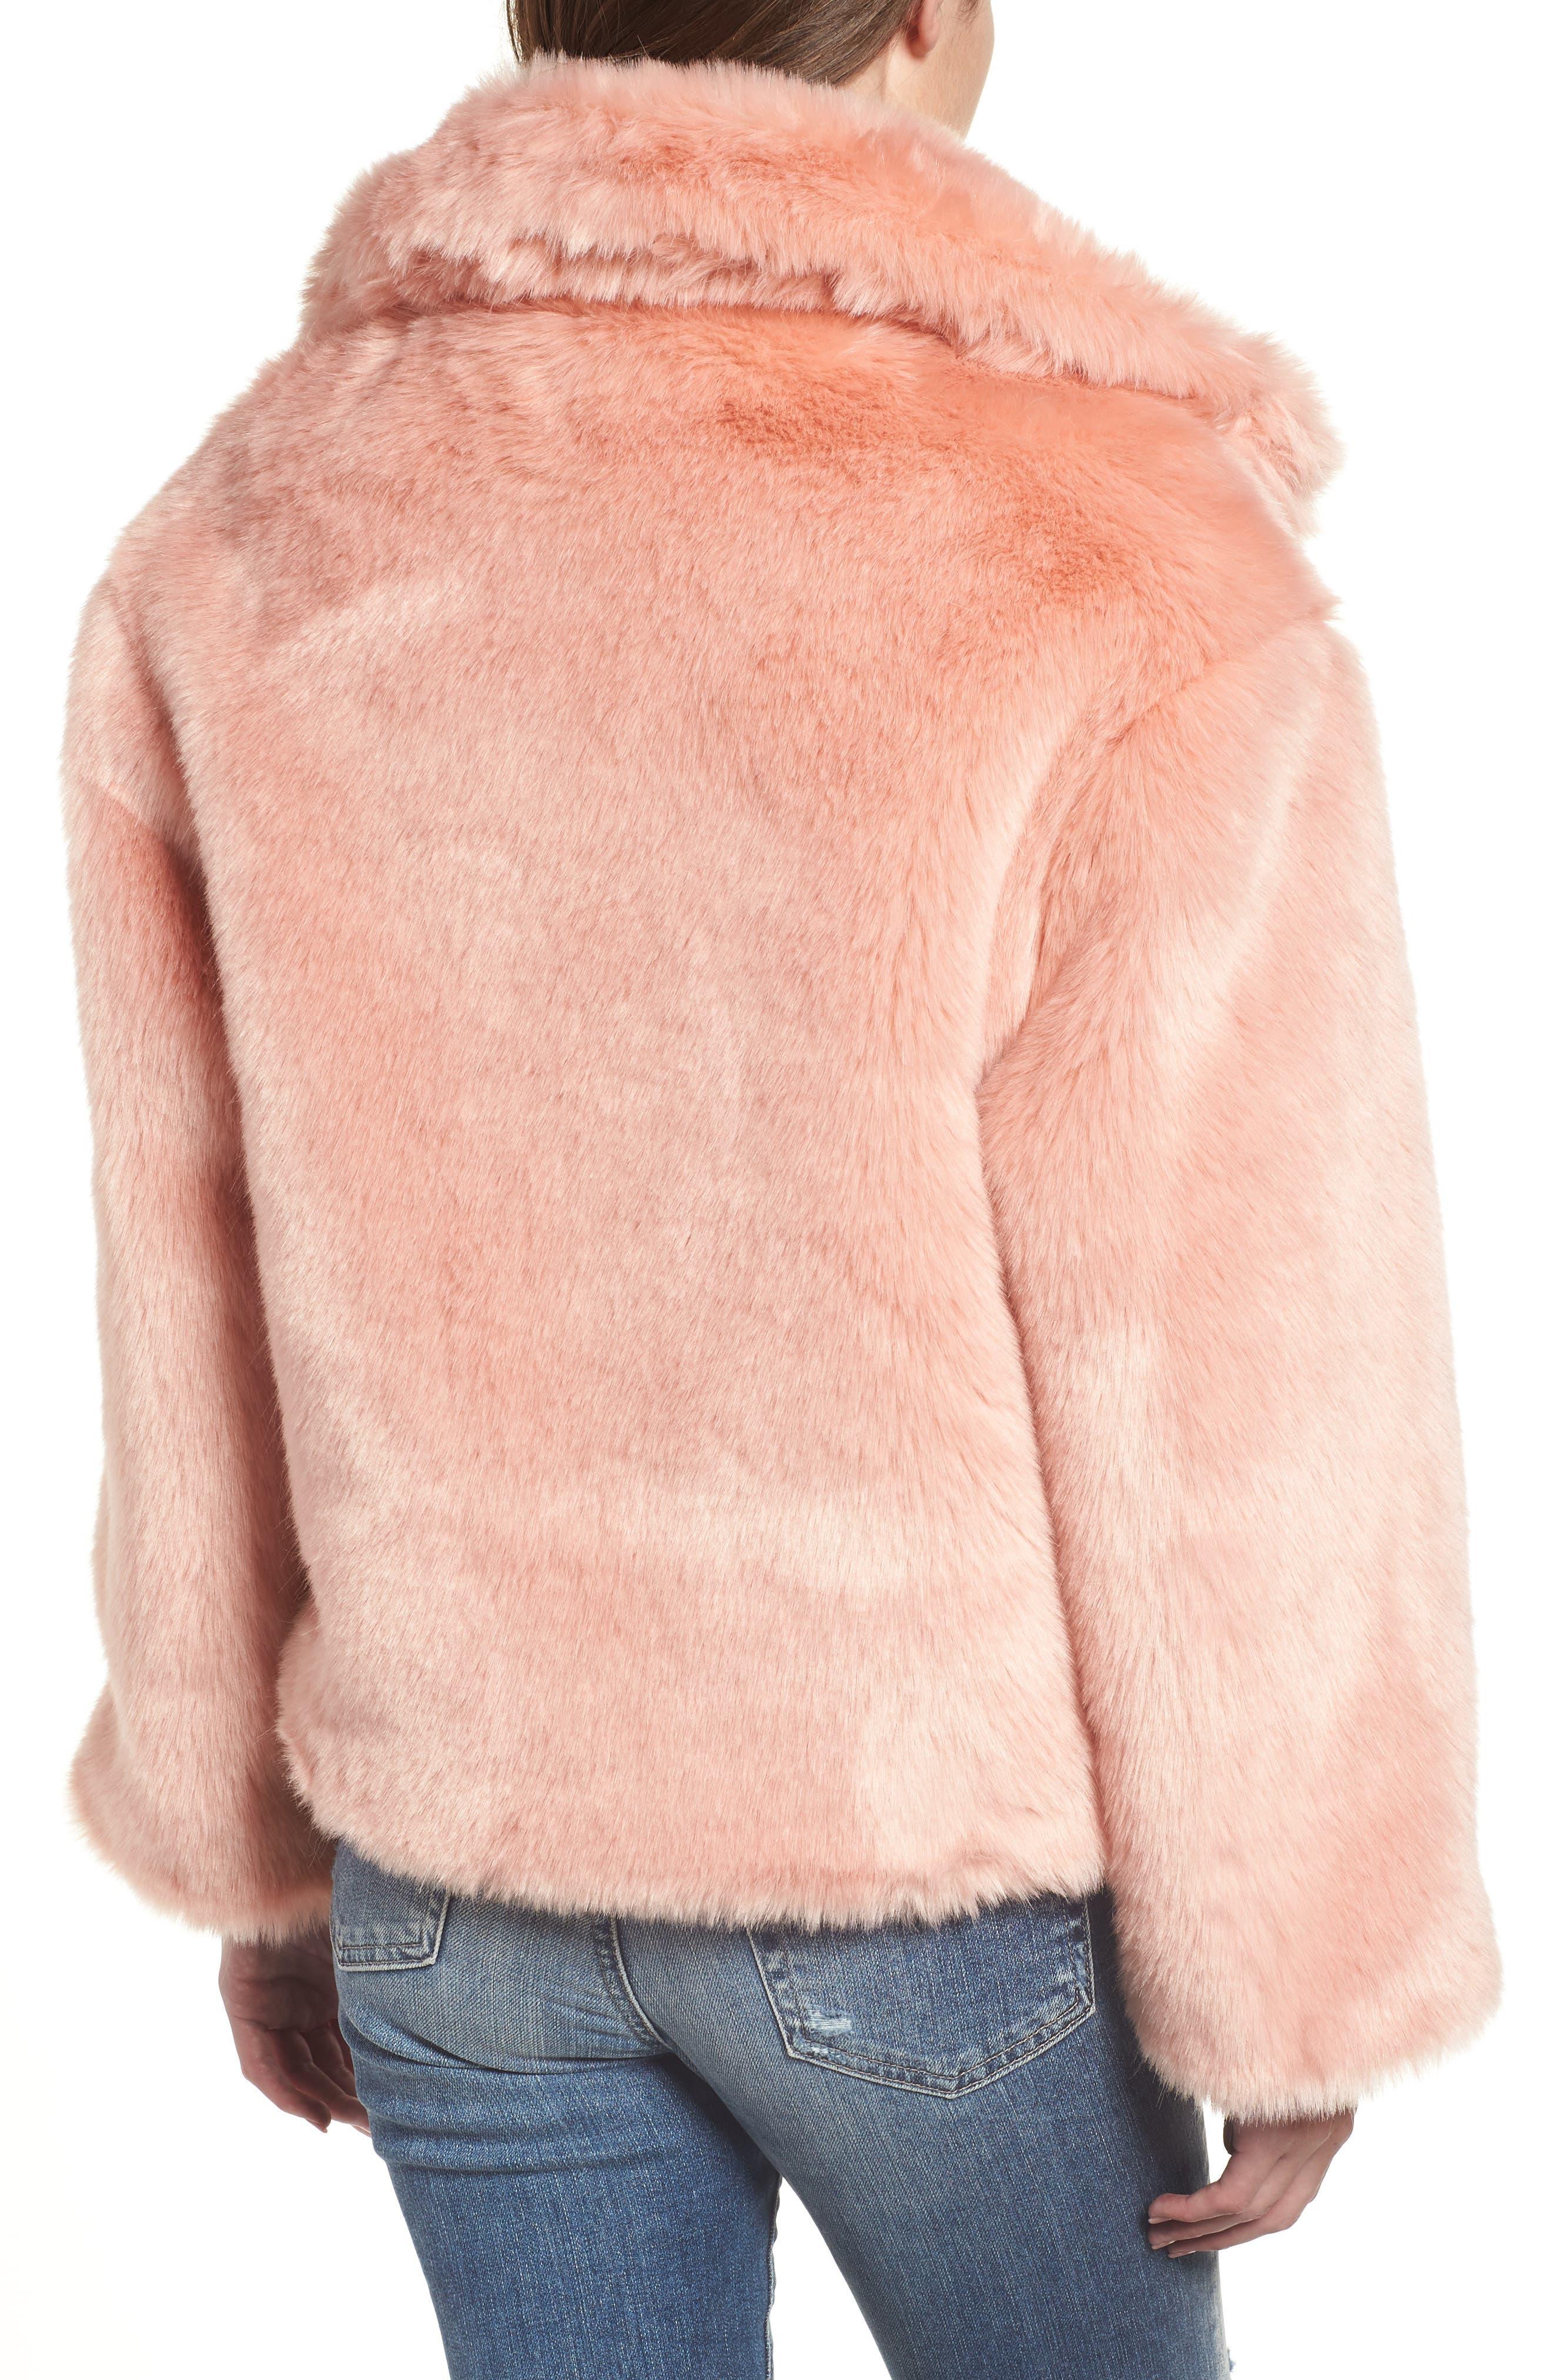 Boxy Faux Fur Coat,                             Alternate thumbnail 2, color,                             CHERRY BLOSSOM